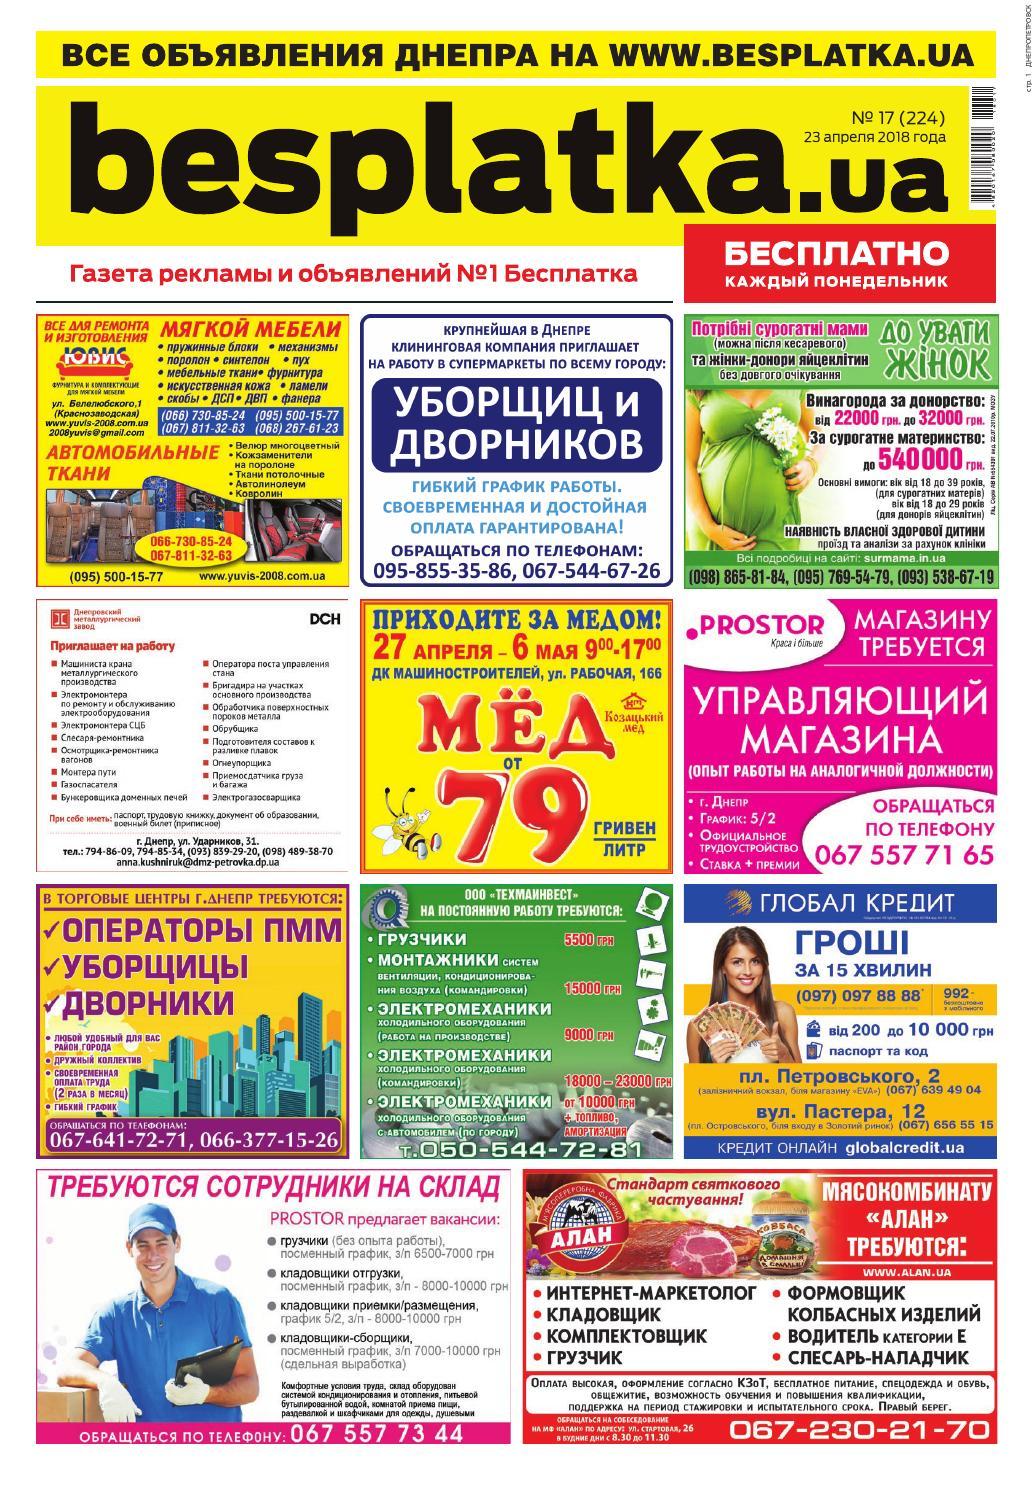 Besplatka  17 Днепр by besplatka ukraine - issuu 7f8d25390c5